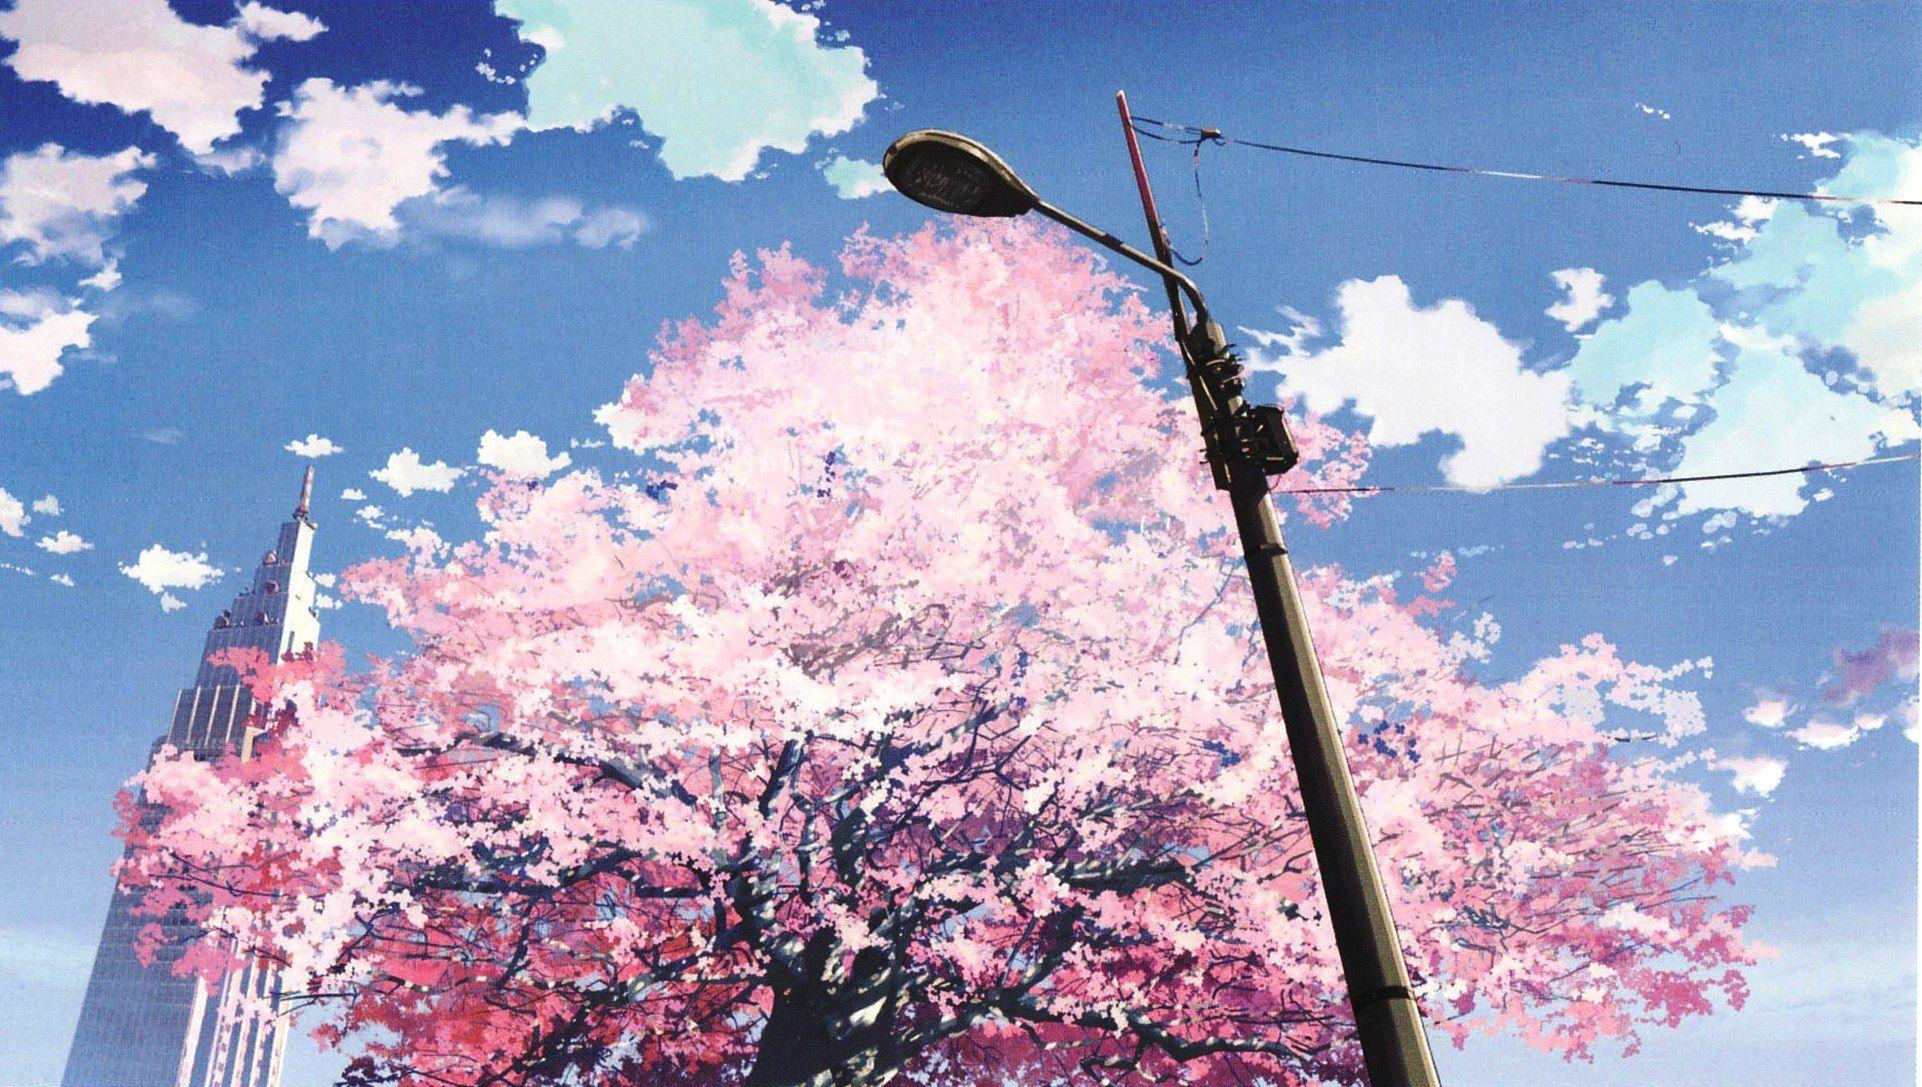 sakura tree in blossom Google Search Anime scenery